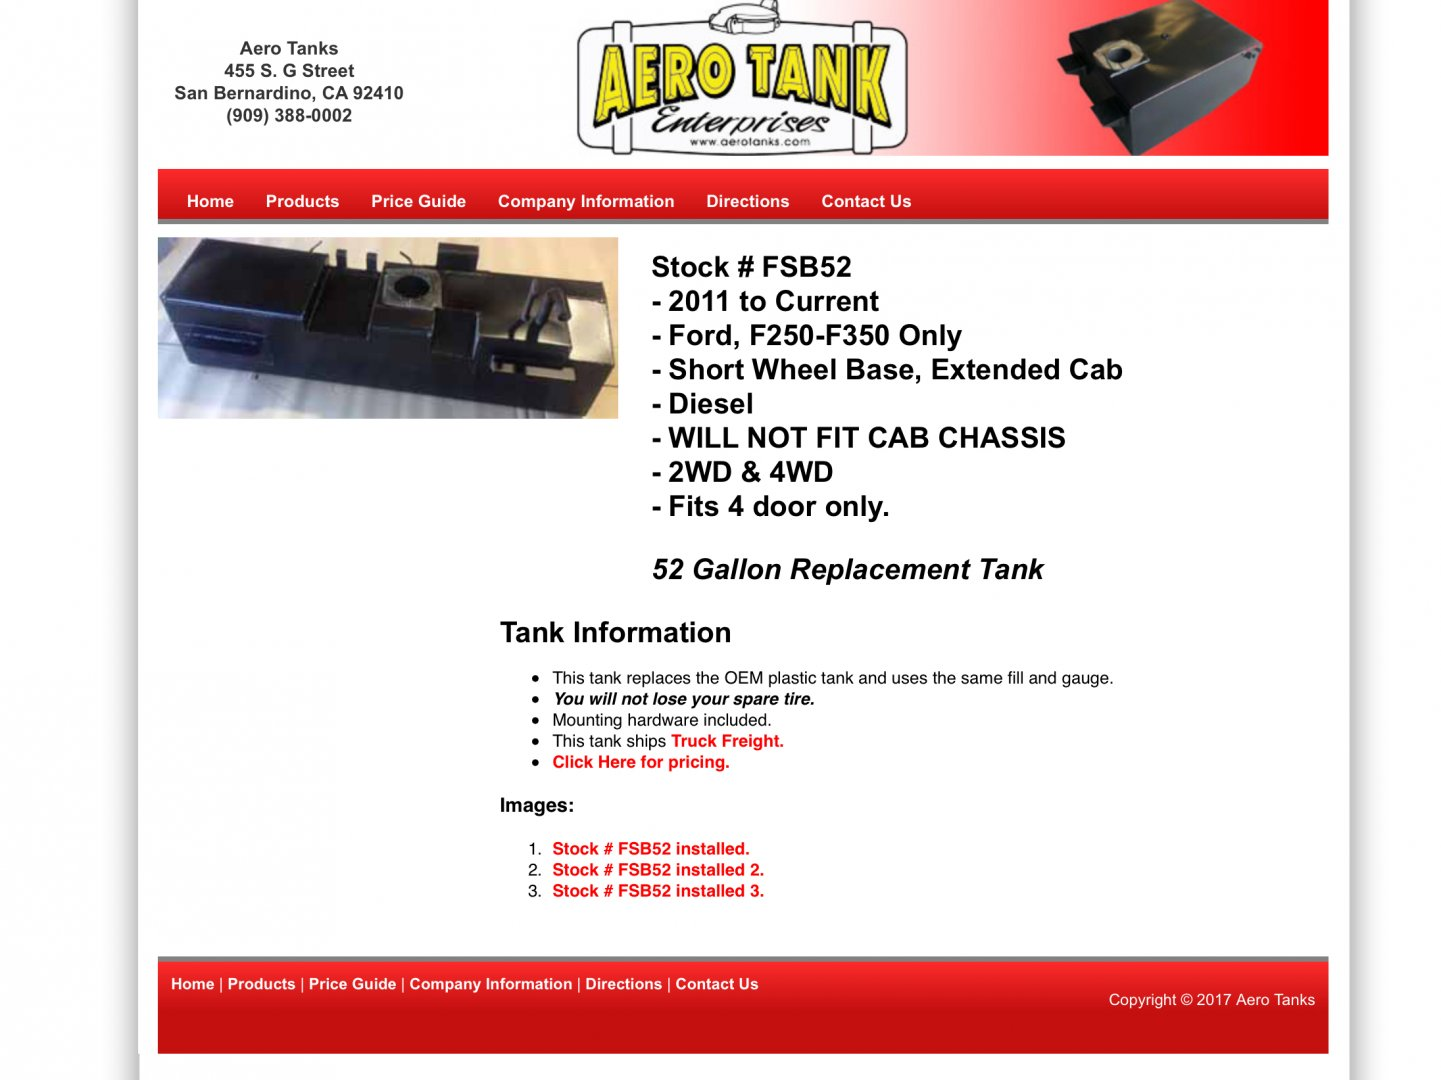 5AC3F3D5-6013-439E-9EC7-A59DA623B436.jpeg